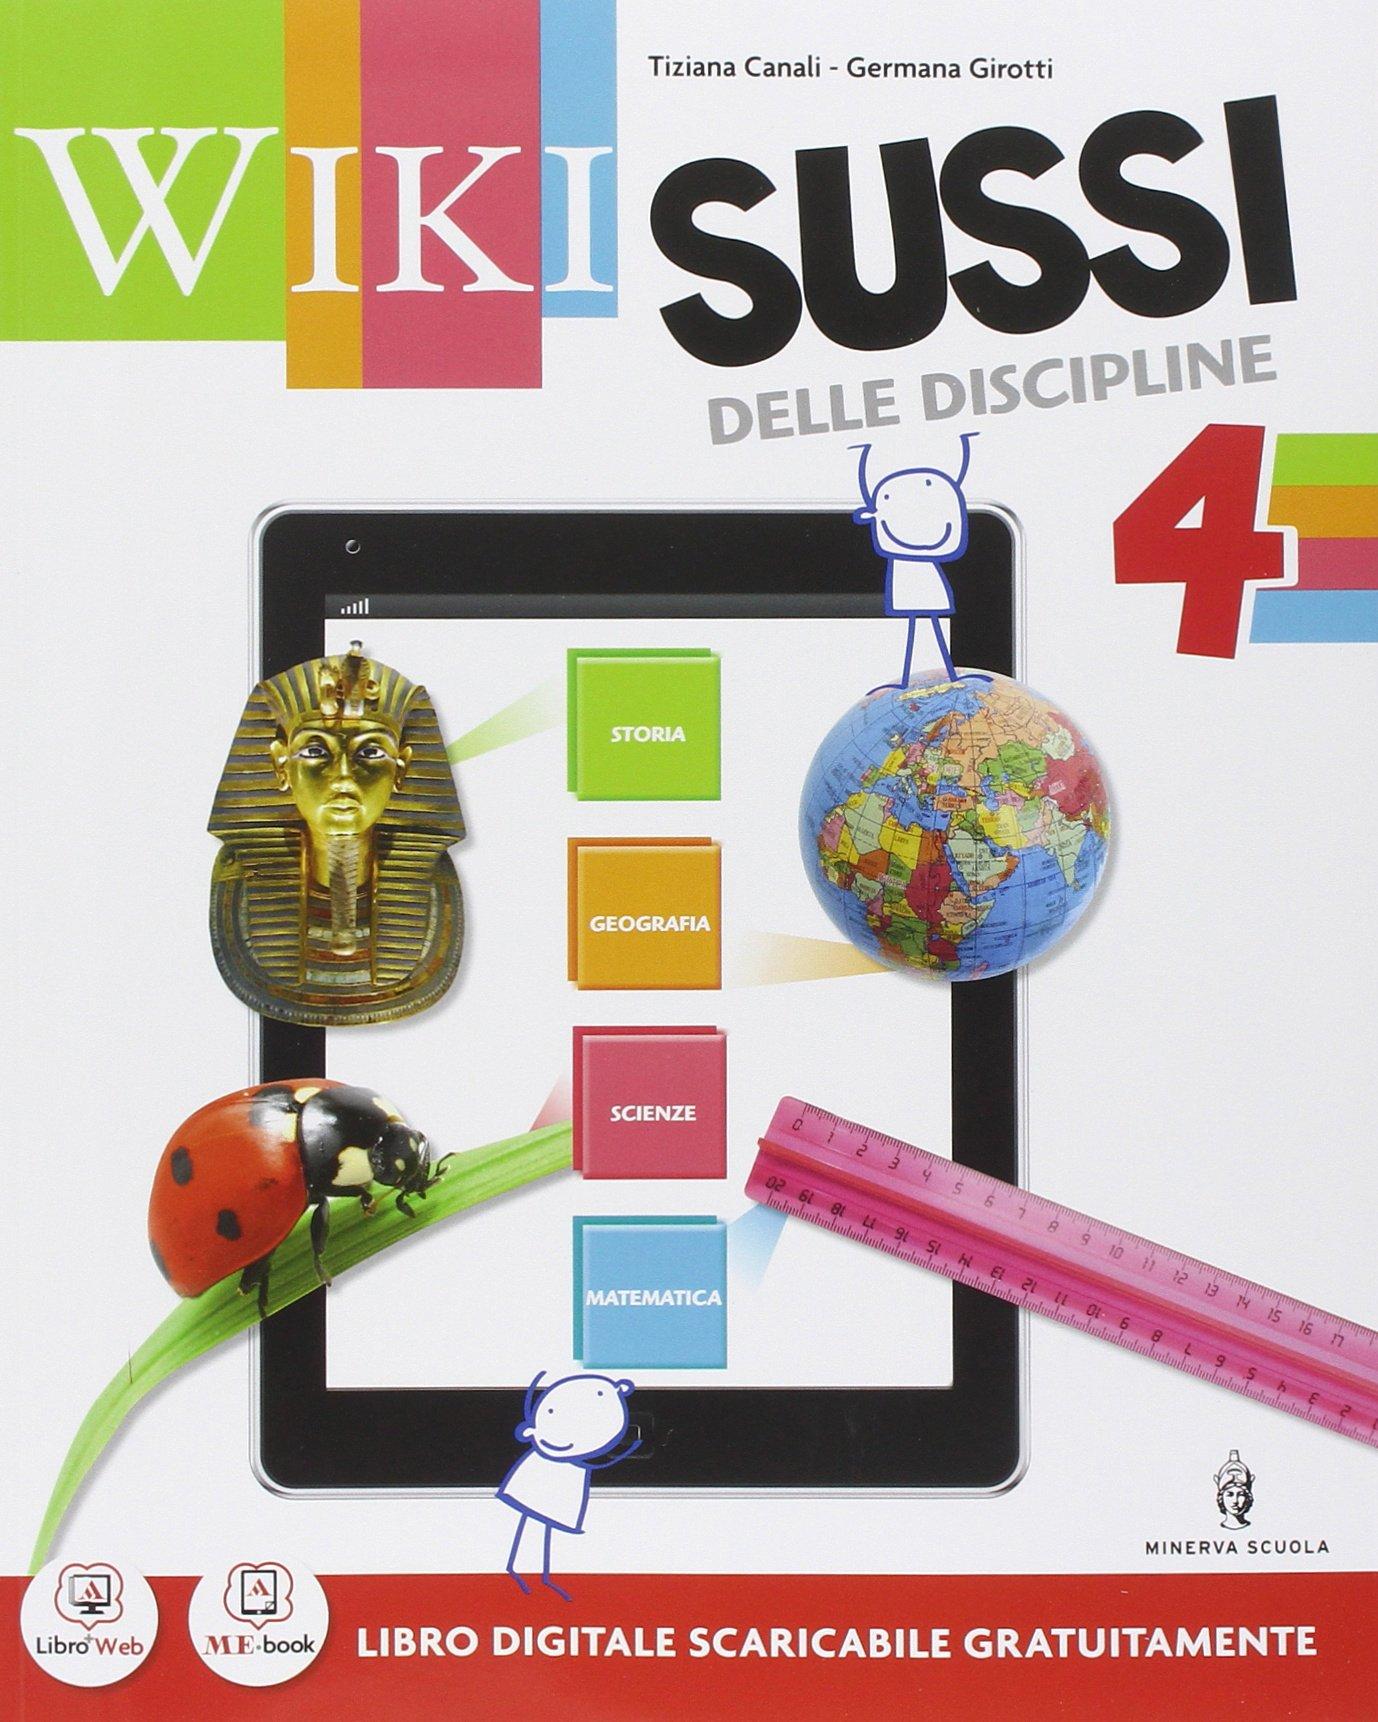 SCARICARE WIKISUSSI DA - cursosgratuitosbr.org